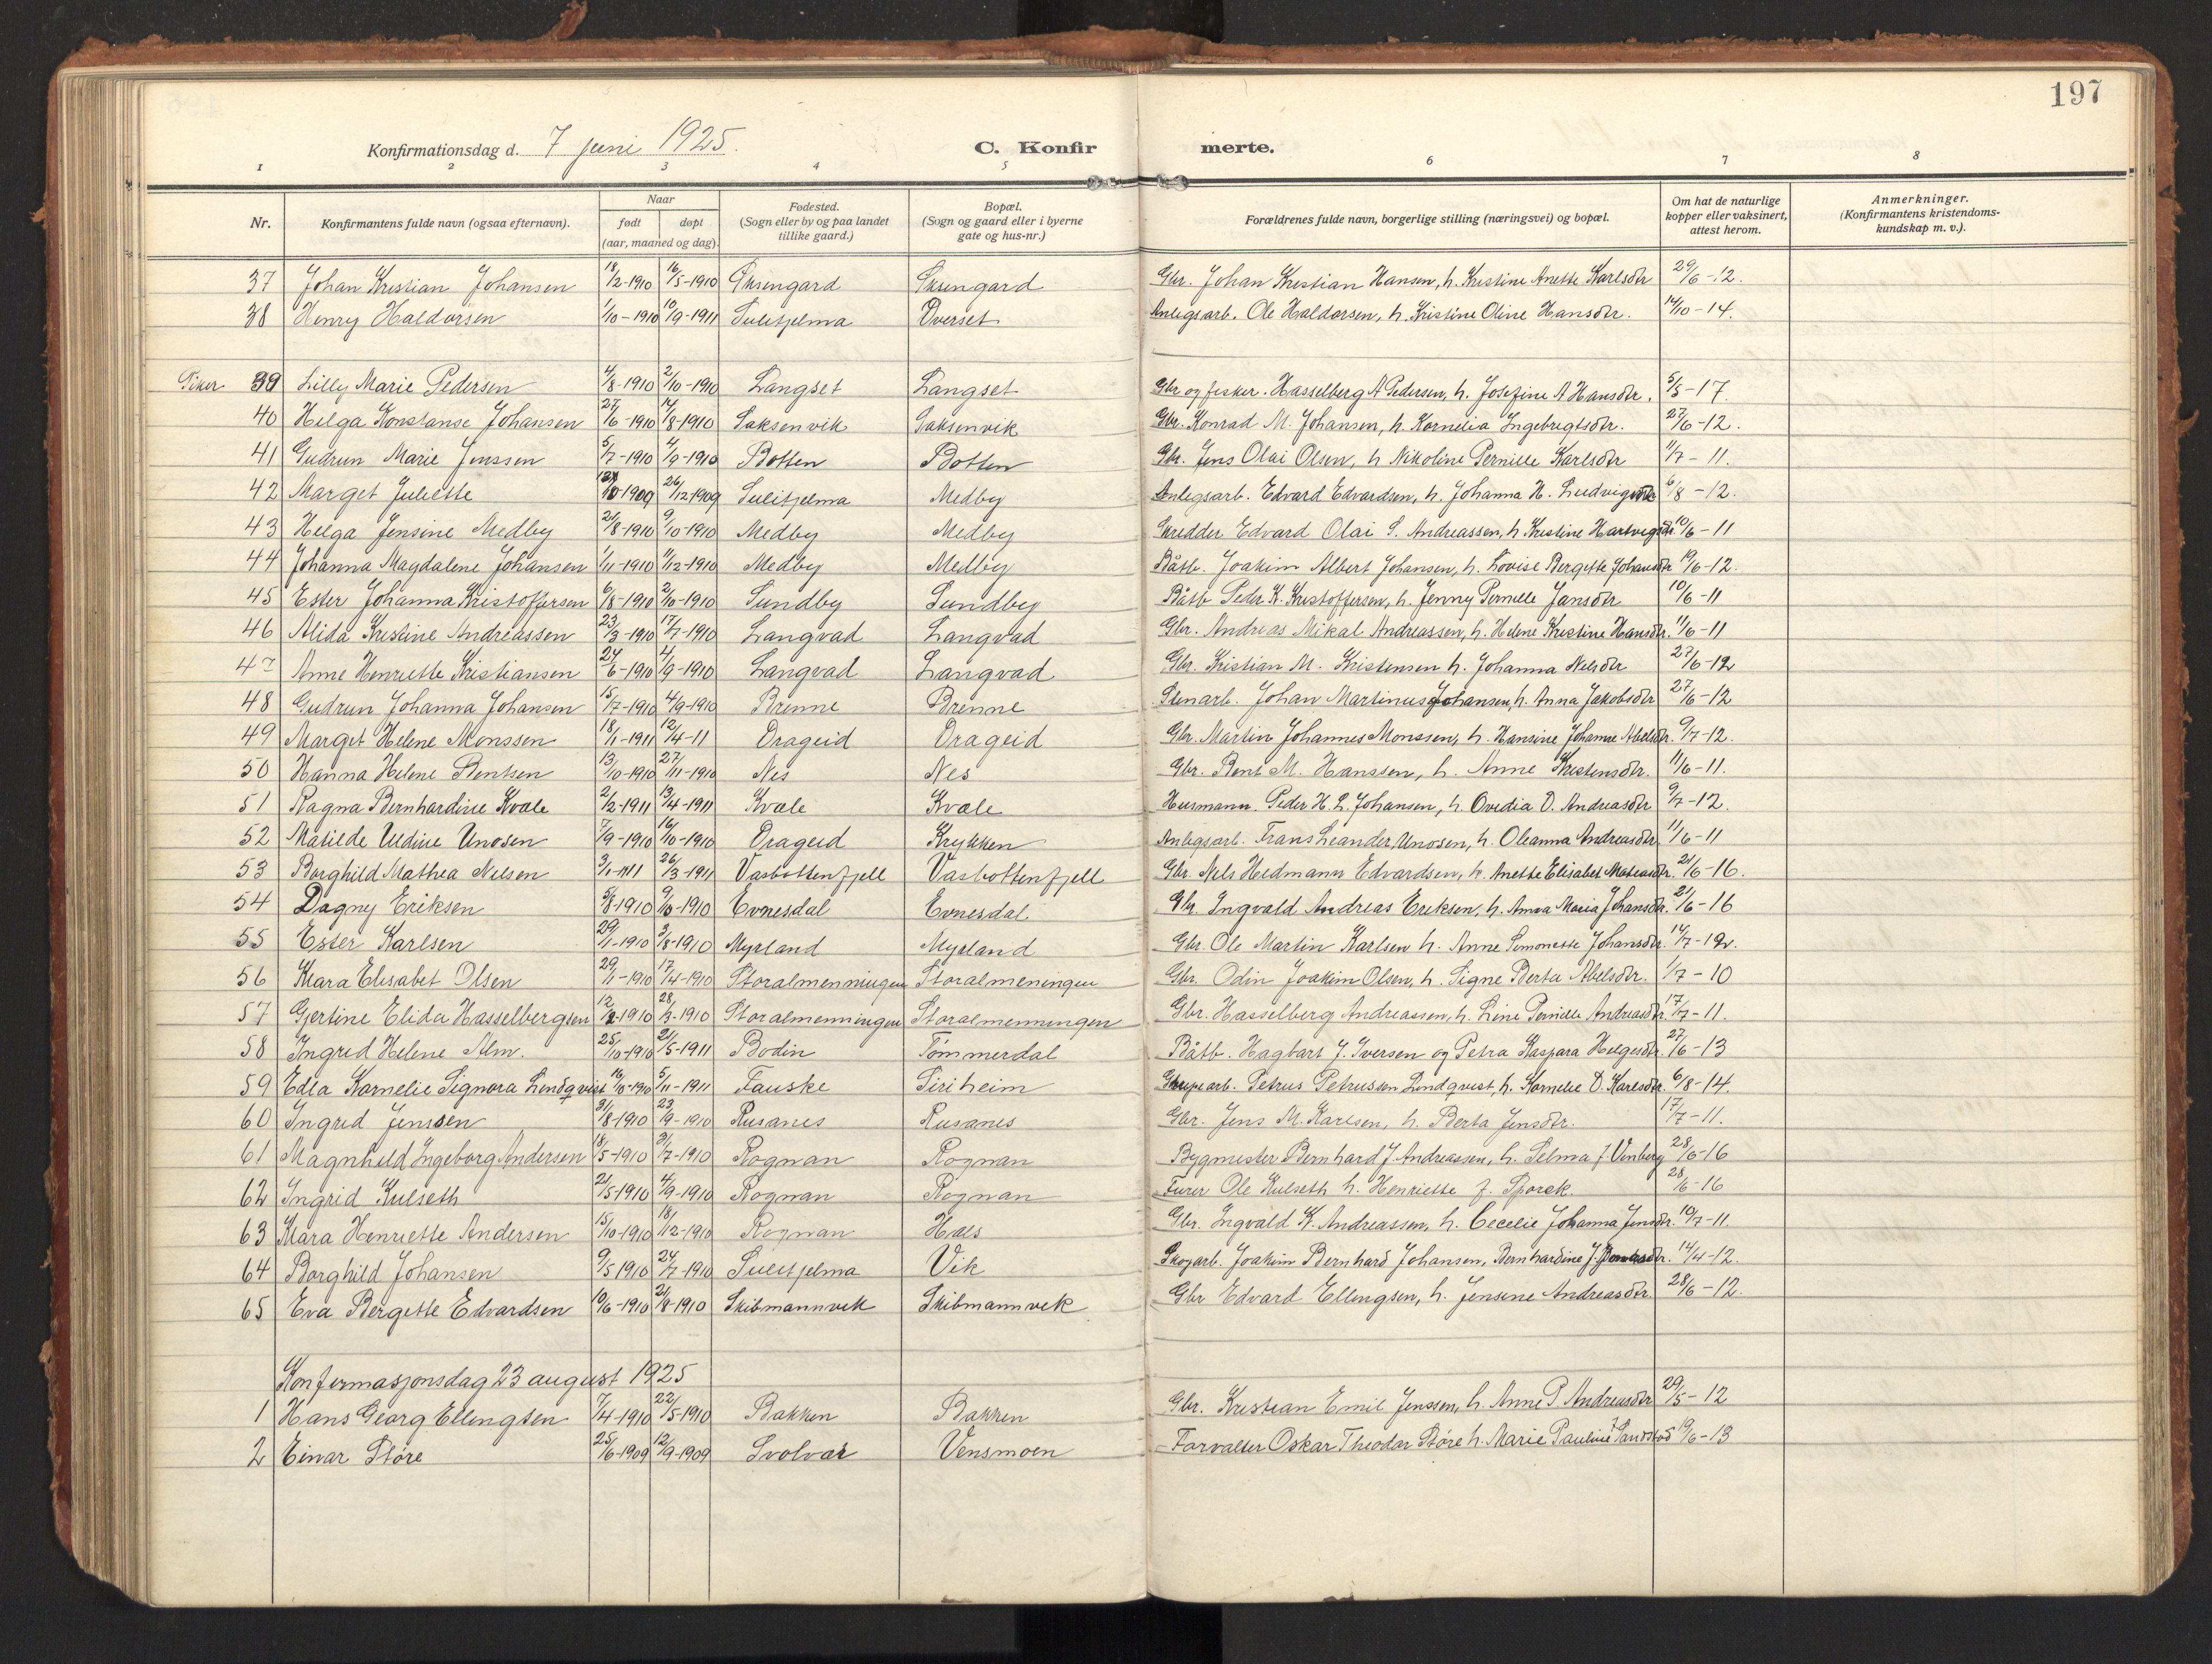 SAT, Ministerialprotokoller, klokkerbøker og fødselsregistre - Nordland, 847/L0683: Klokkerbok nr. 847C11, 1908-1929, s. 197